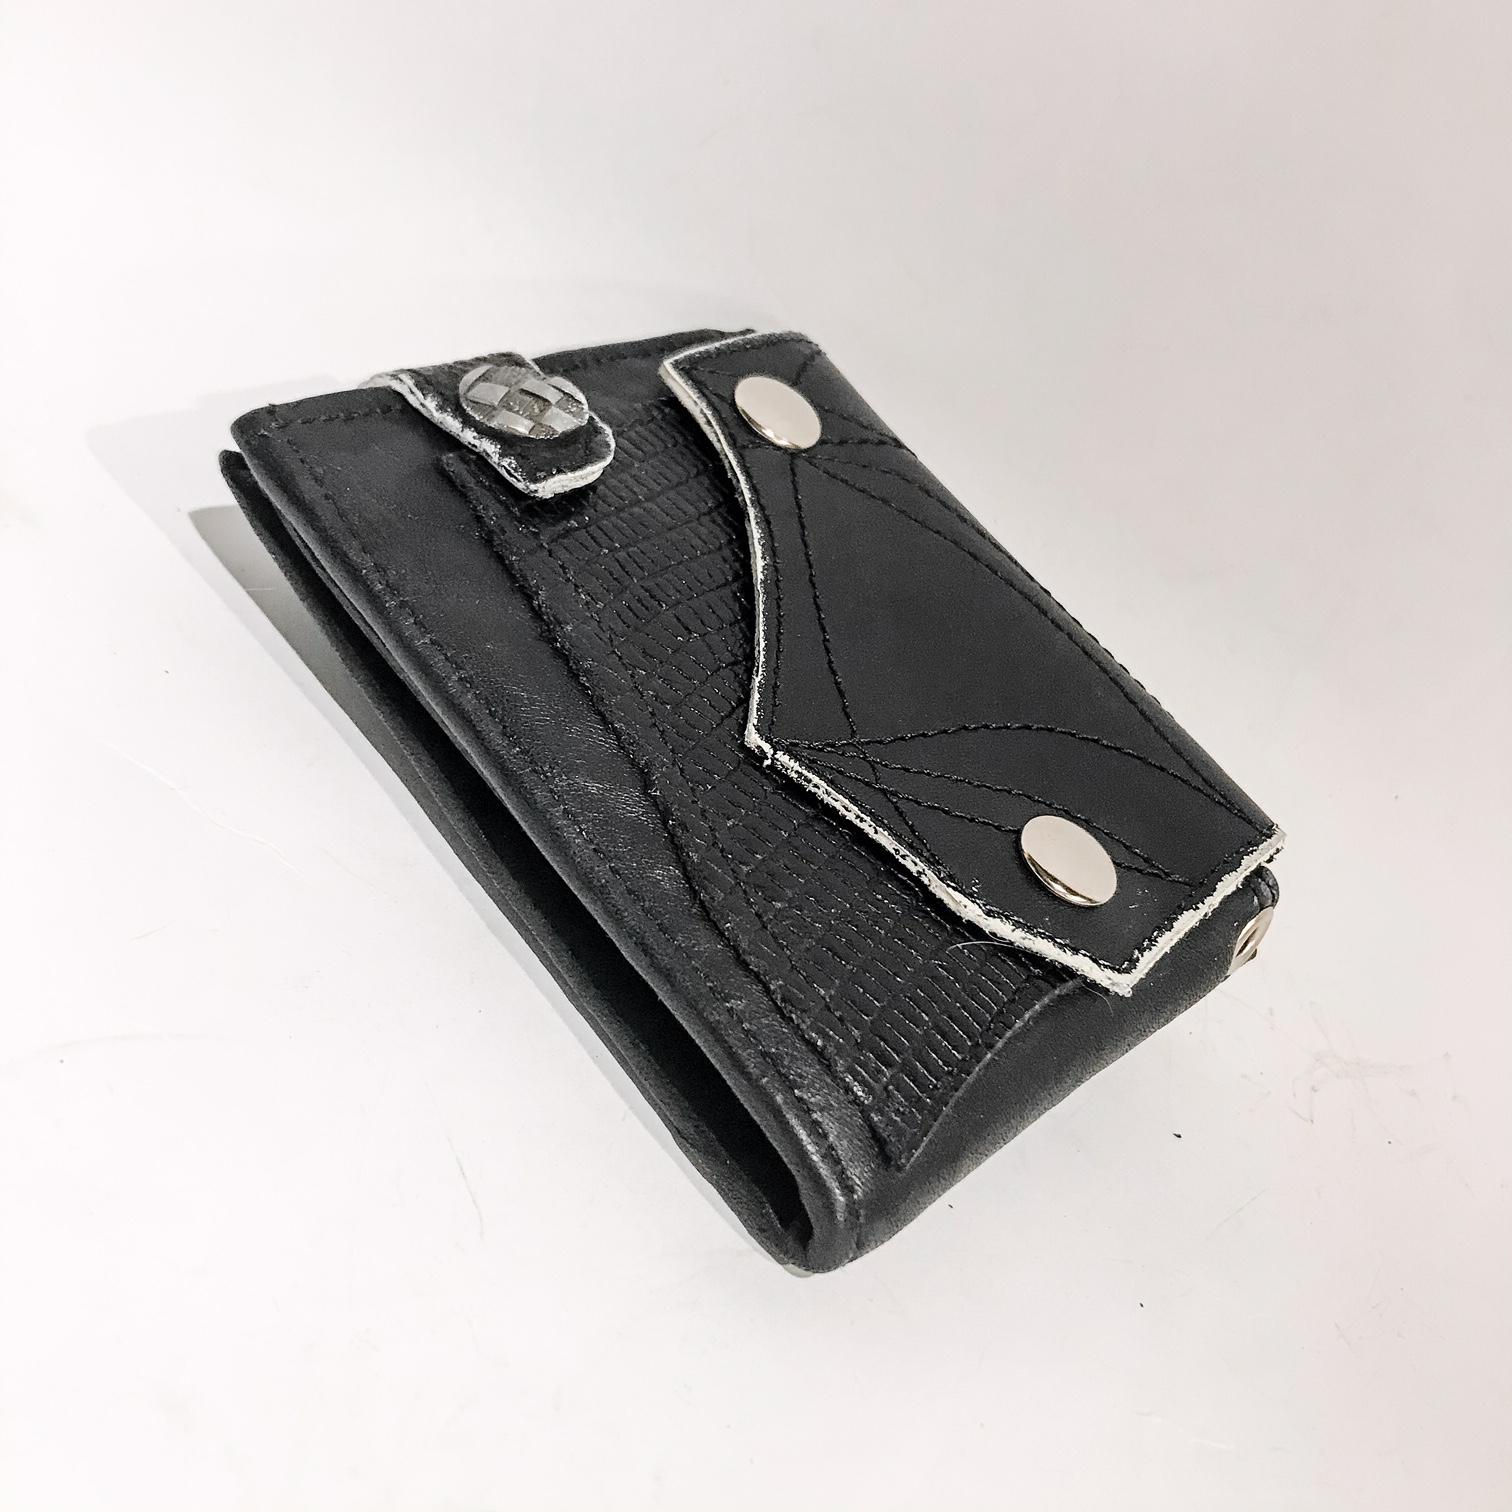 Blackstar GunMetal Leather Wallet EvilEve